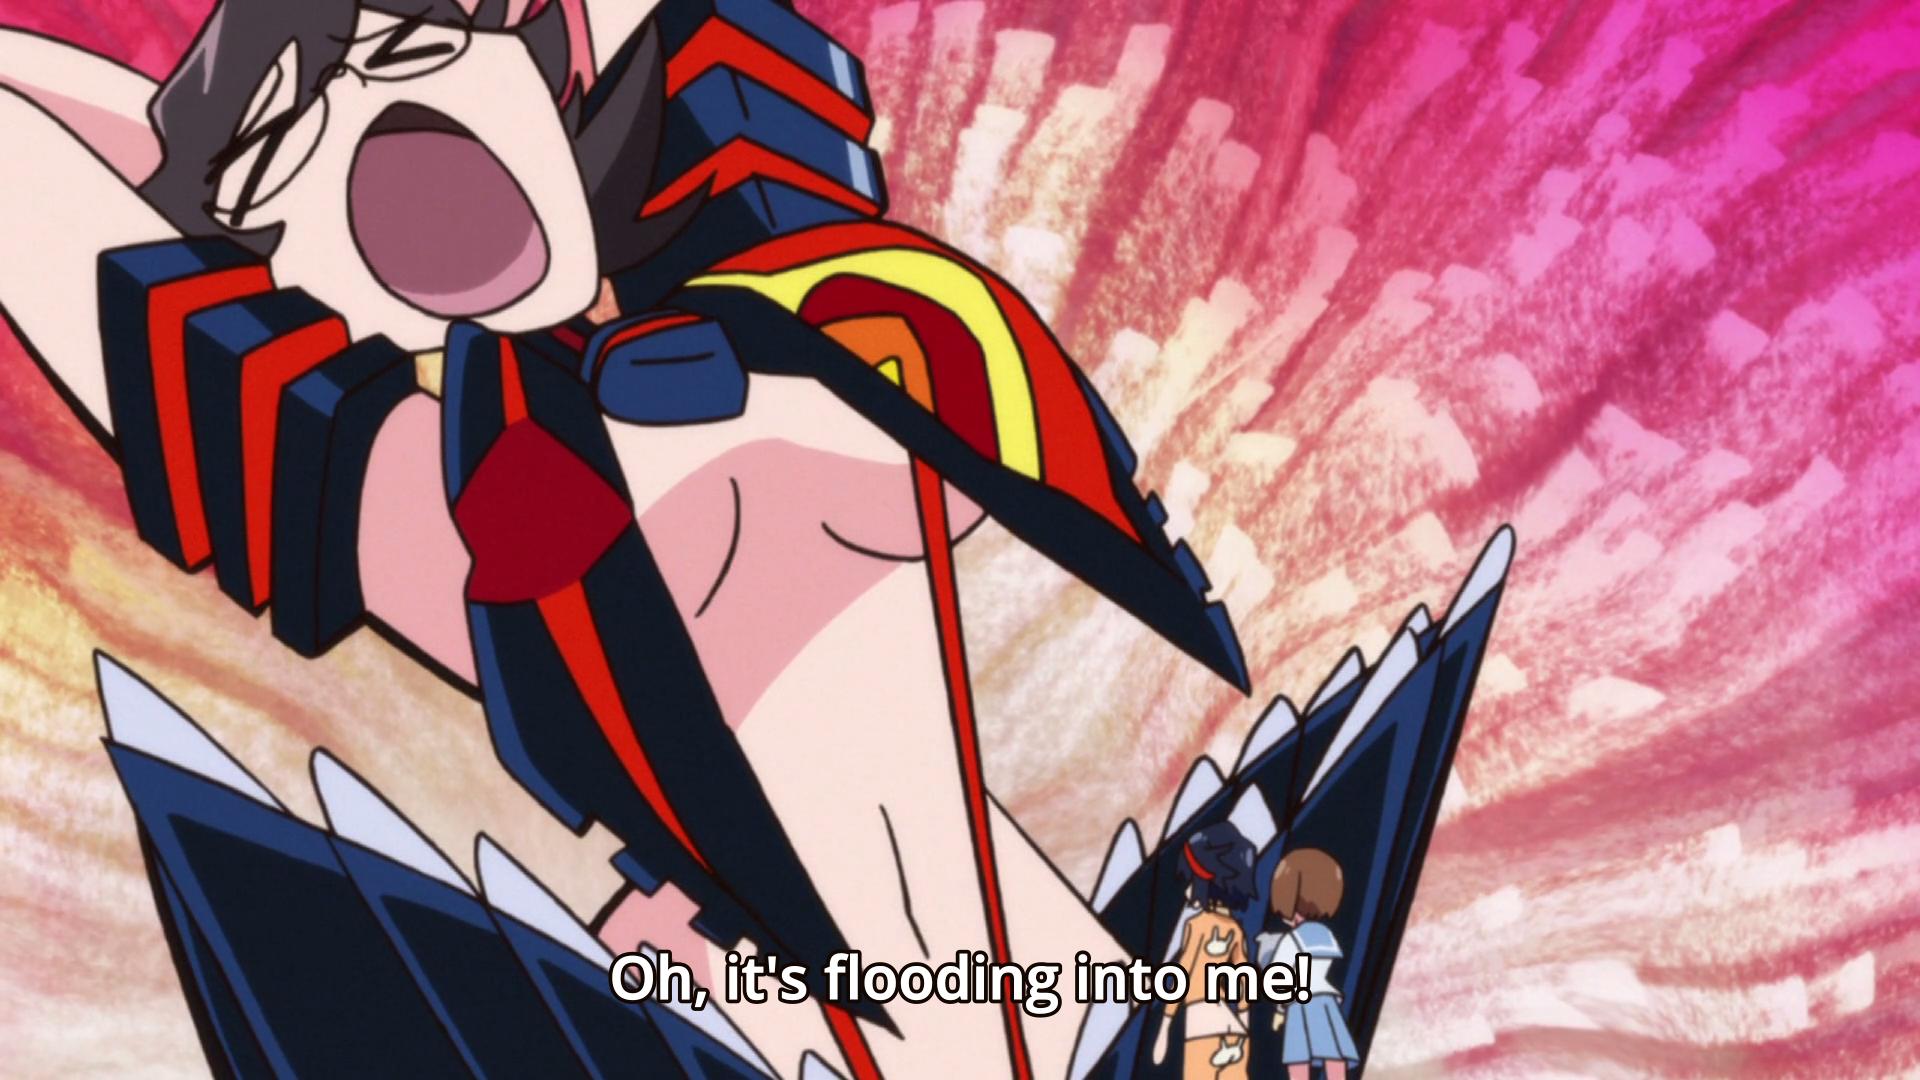 Kill hentai 3D Hentai